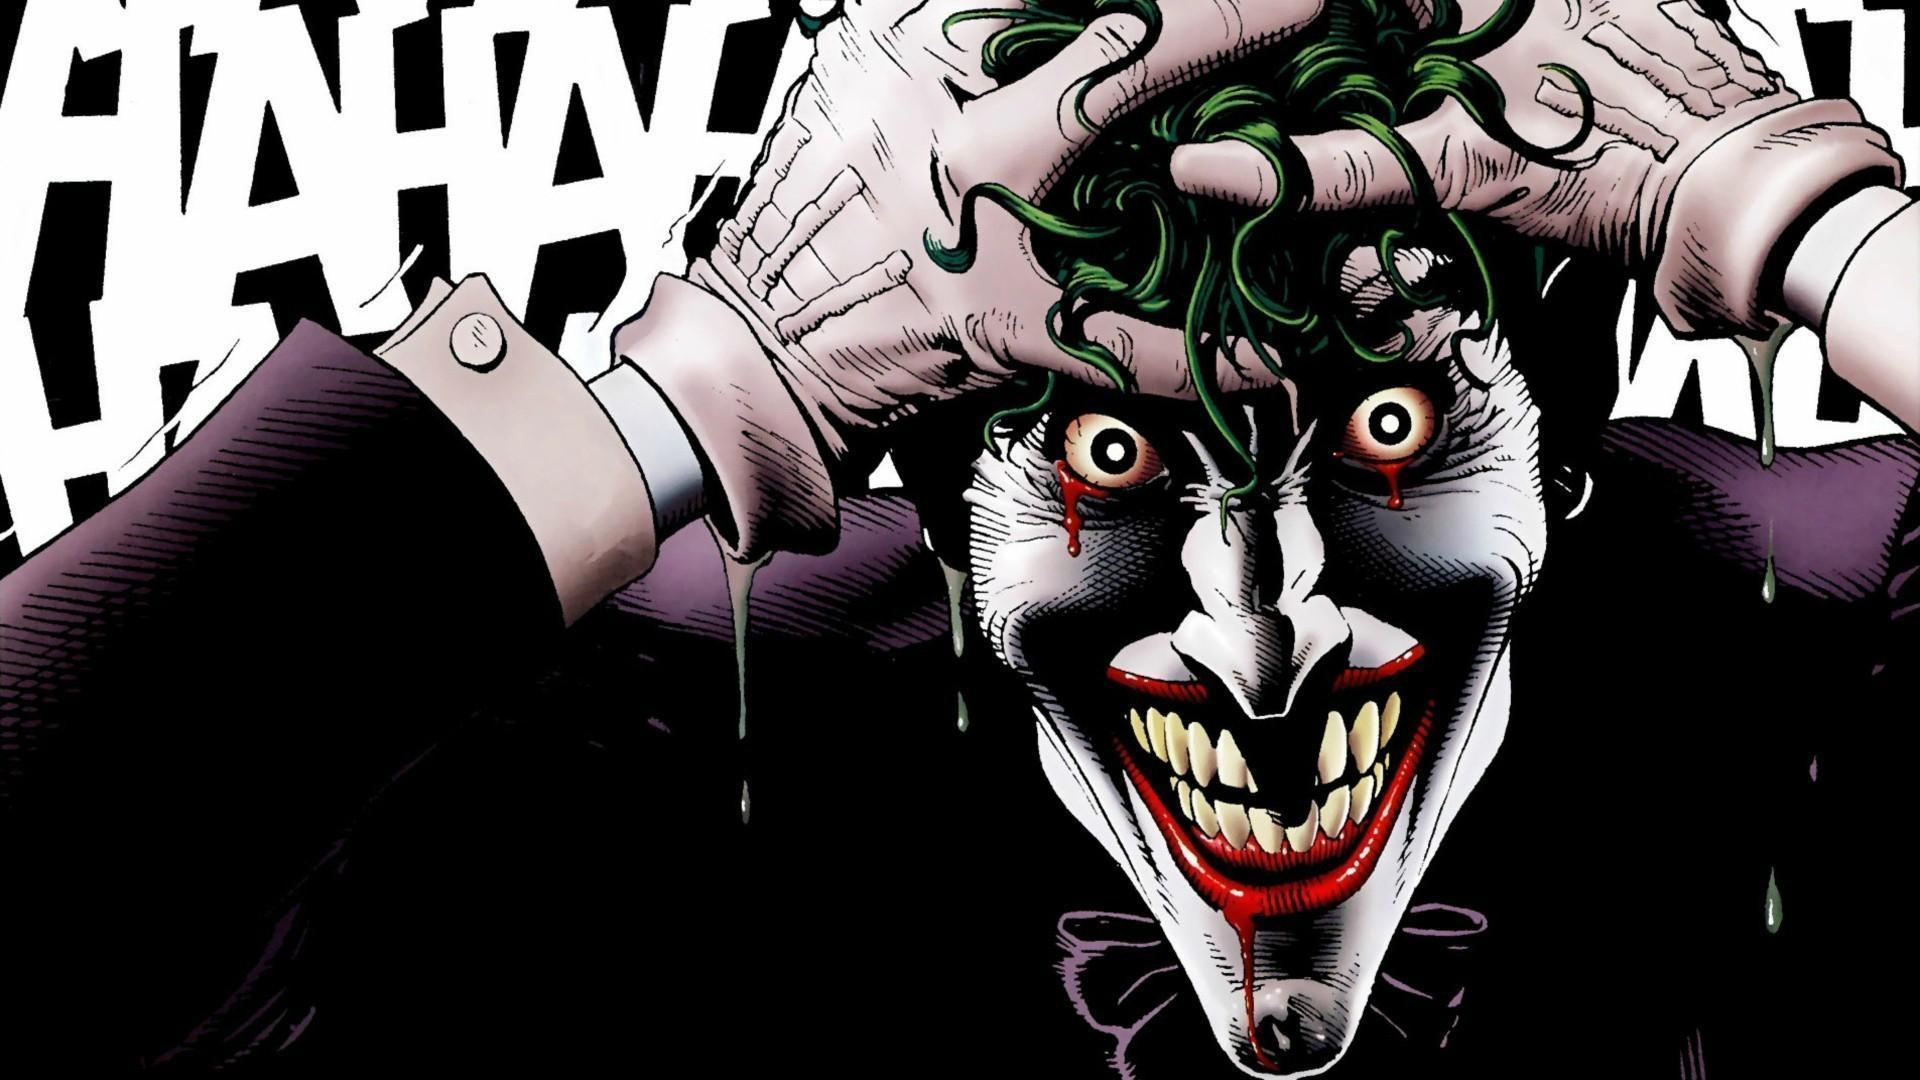 Animated Joker Wallpapers Top Free Animated Joker Backgrounds Wallpaperaccess